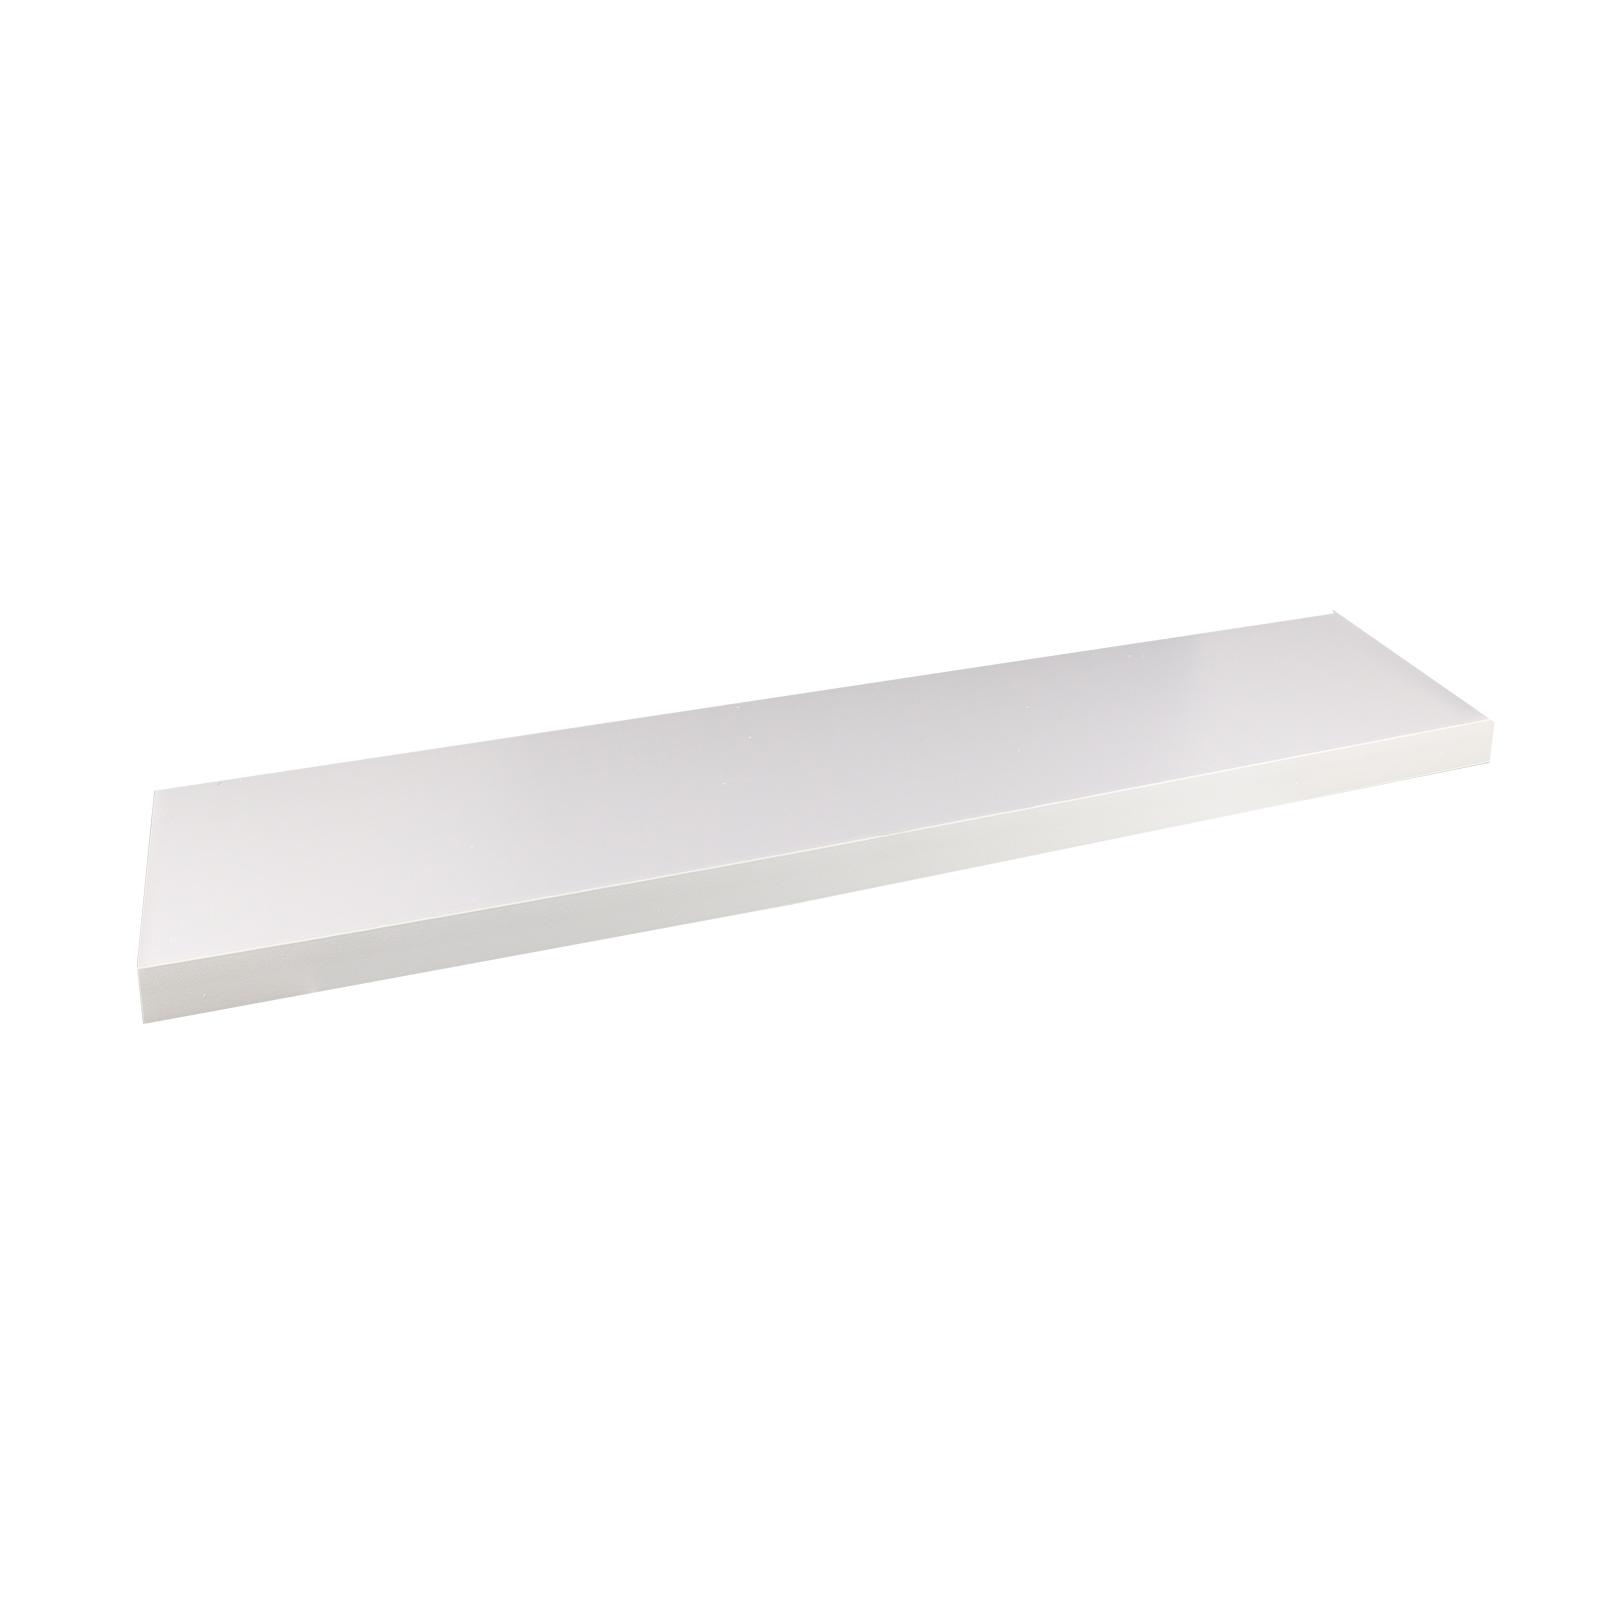 Flexi Storage 600 x 190 x 24mm White Matt Style Shelf